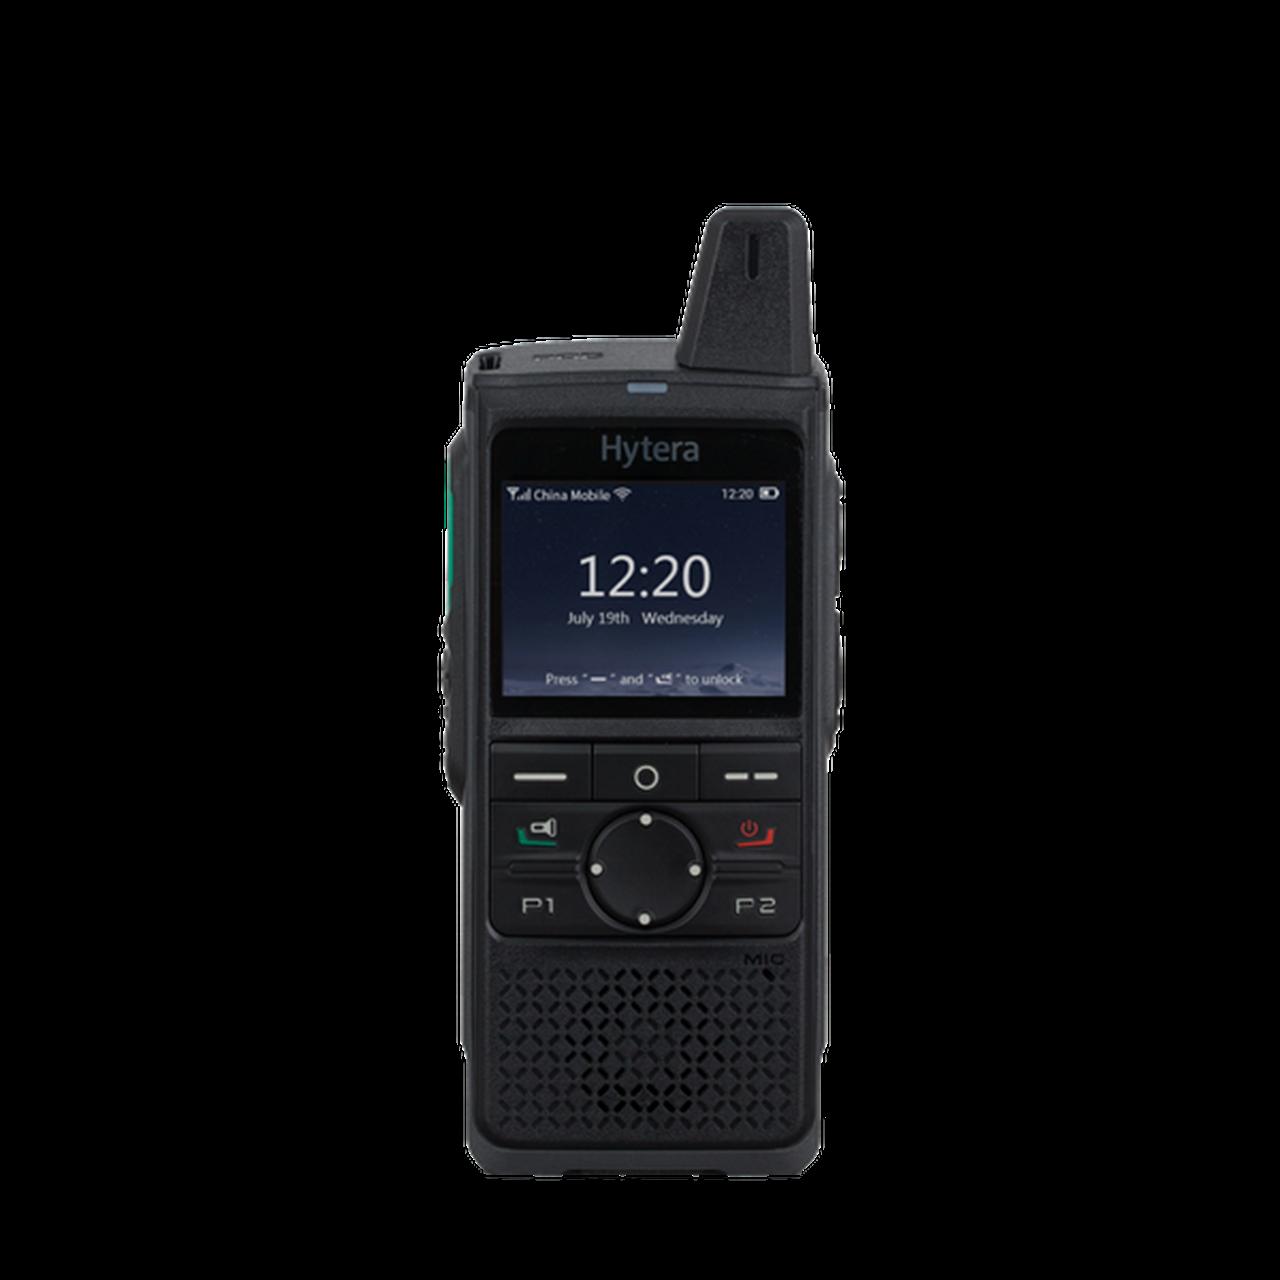 Hytera PNC370 poC Cellular based two way radio